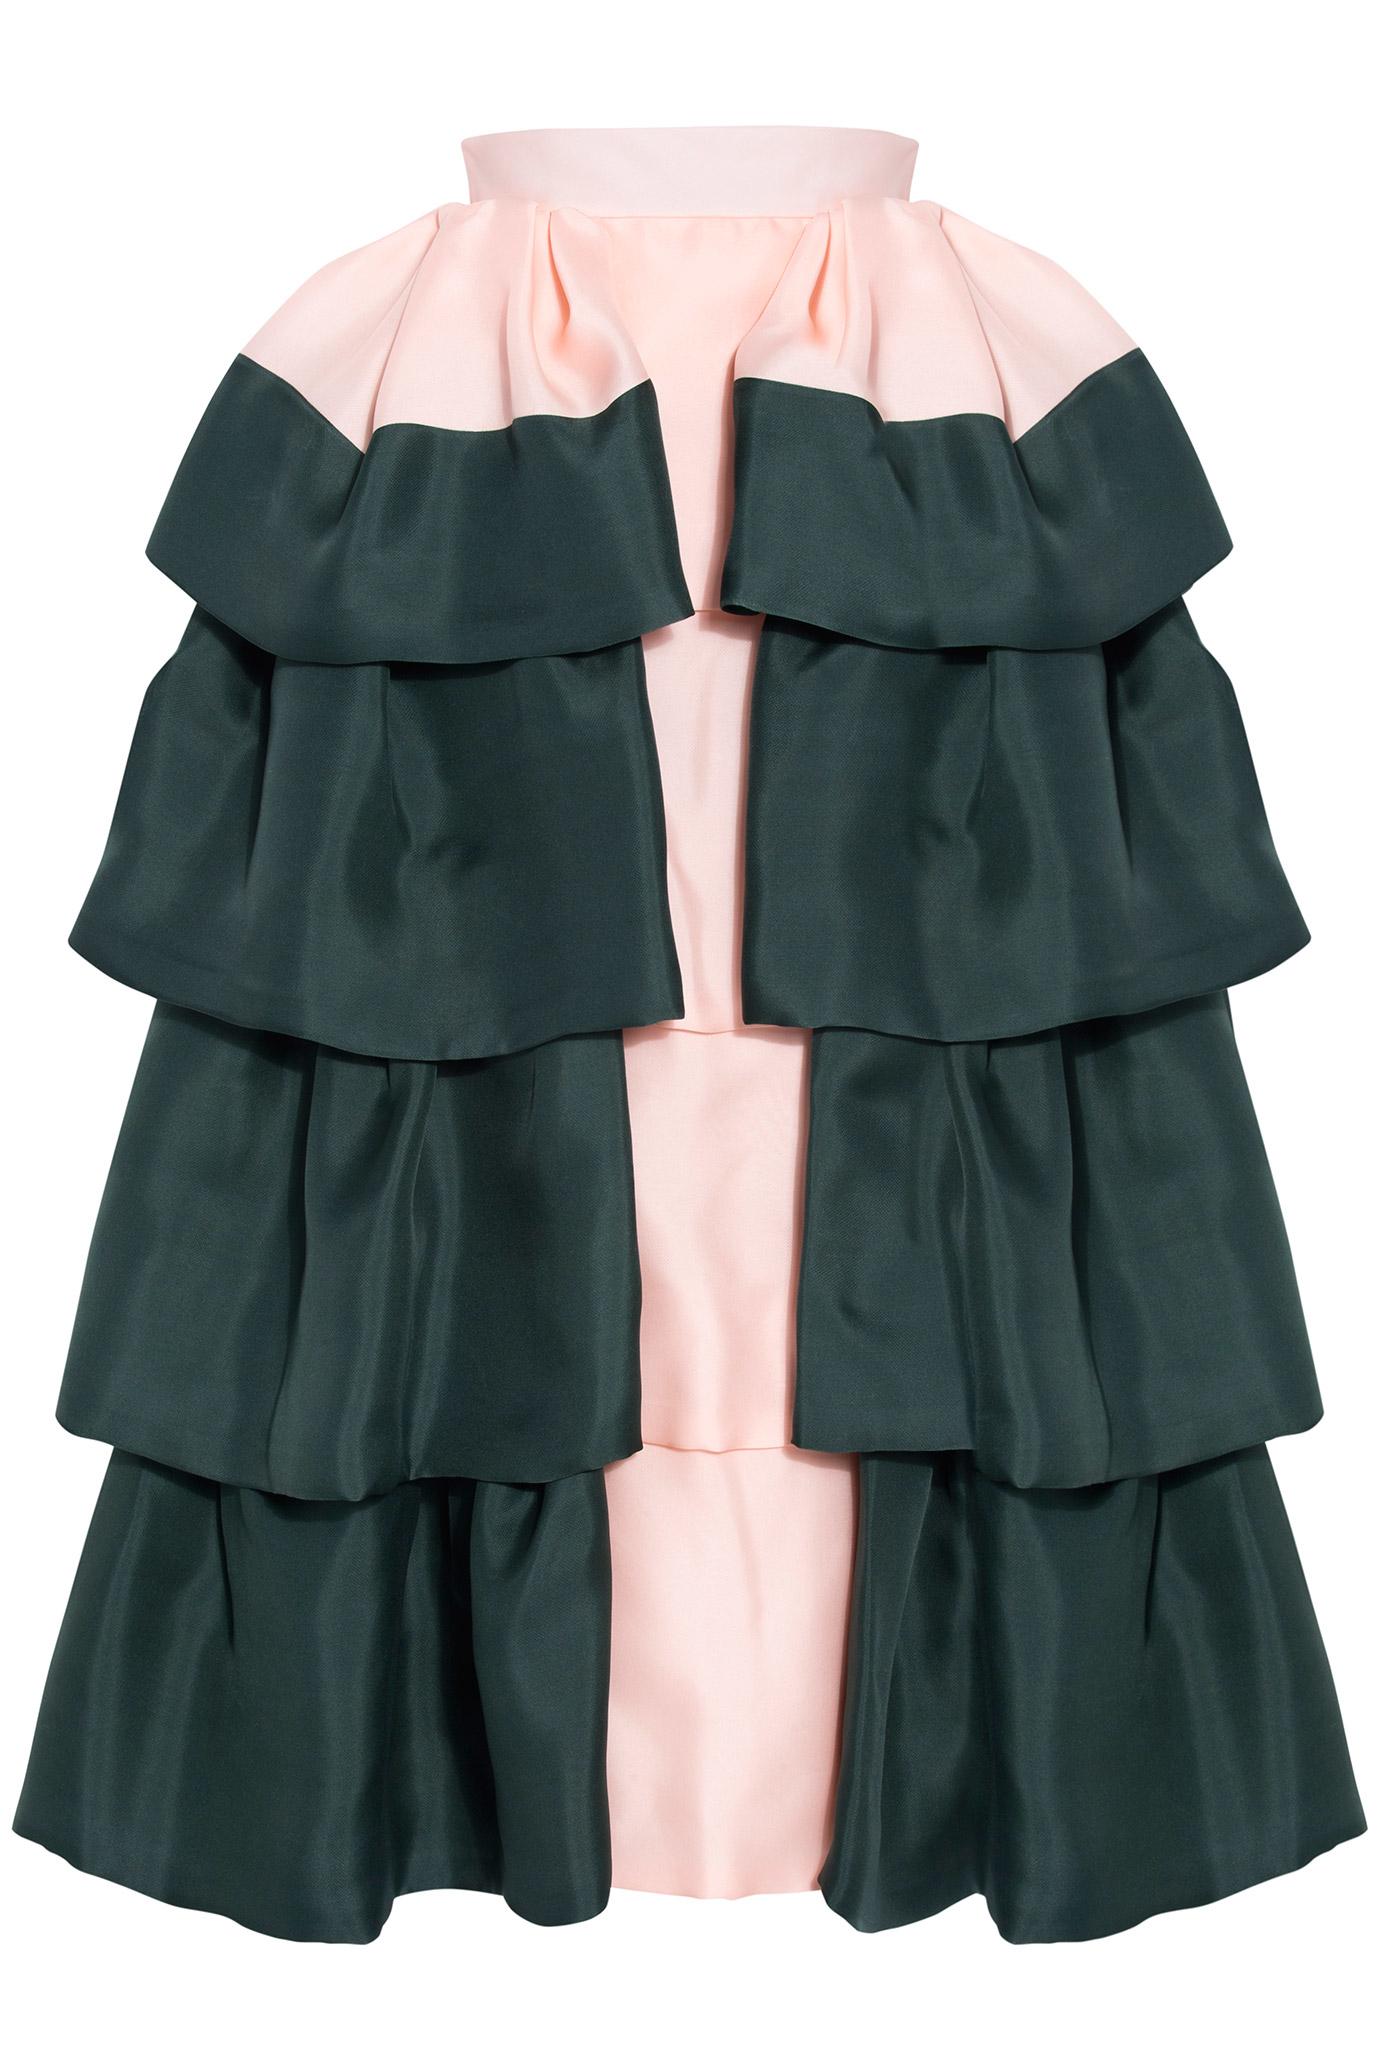 Delpozo Ruffled Long Skirt in Black | Lyst